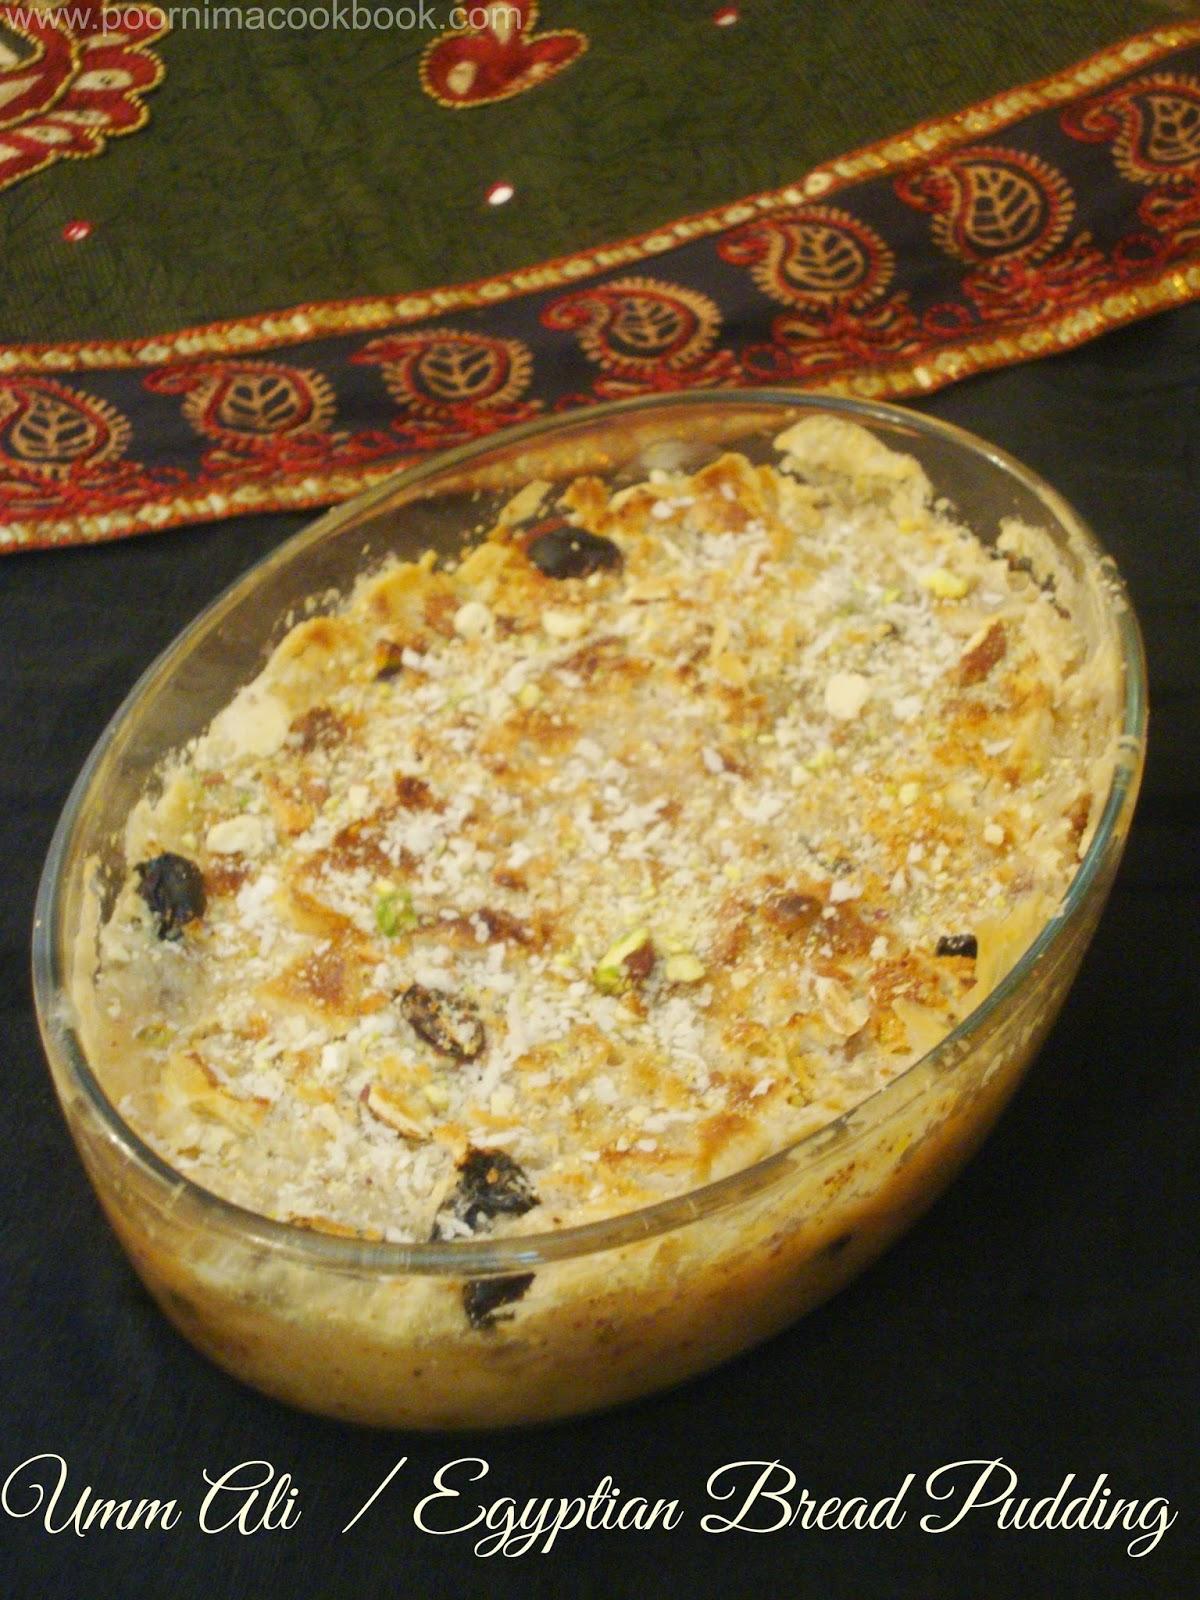 Poornimas cook book umm ali egyptian bread pudding forumfinder Gallery